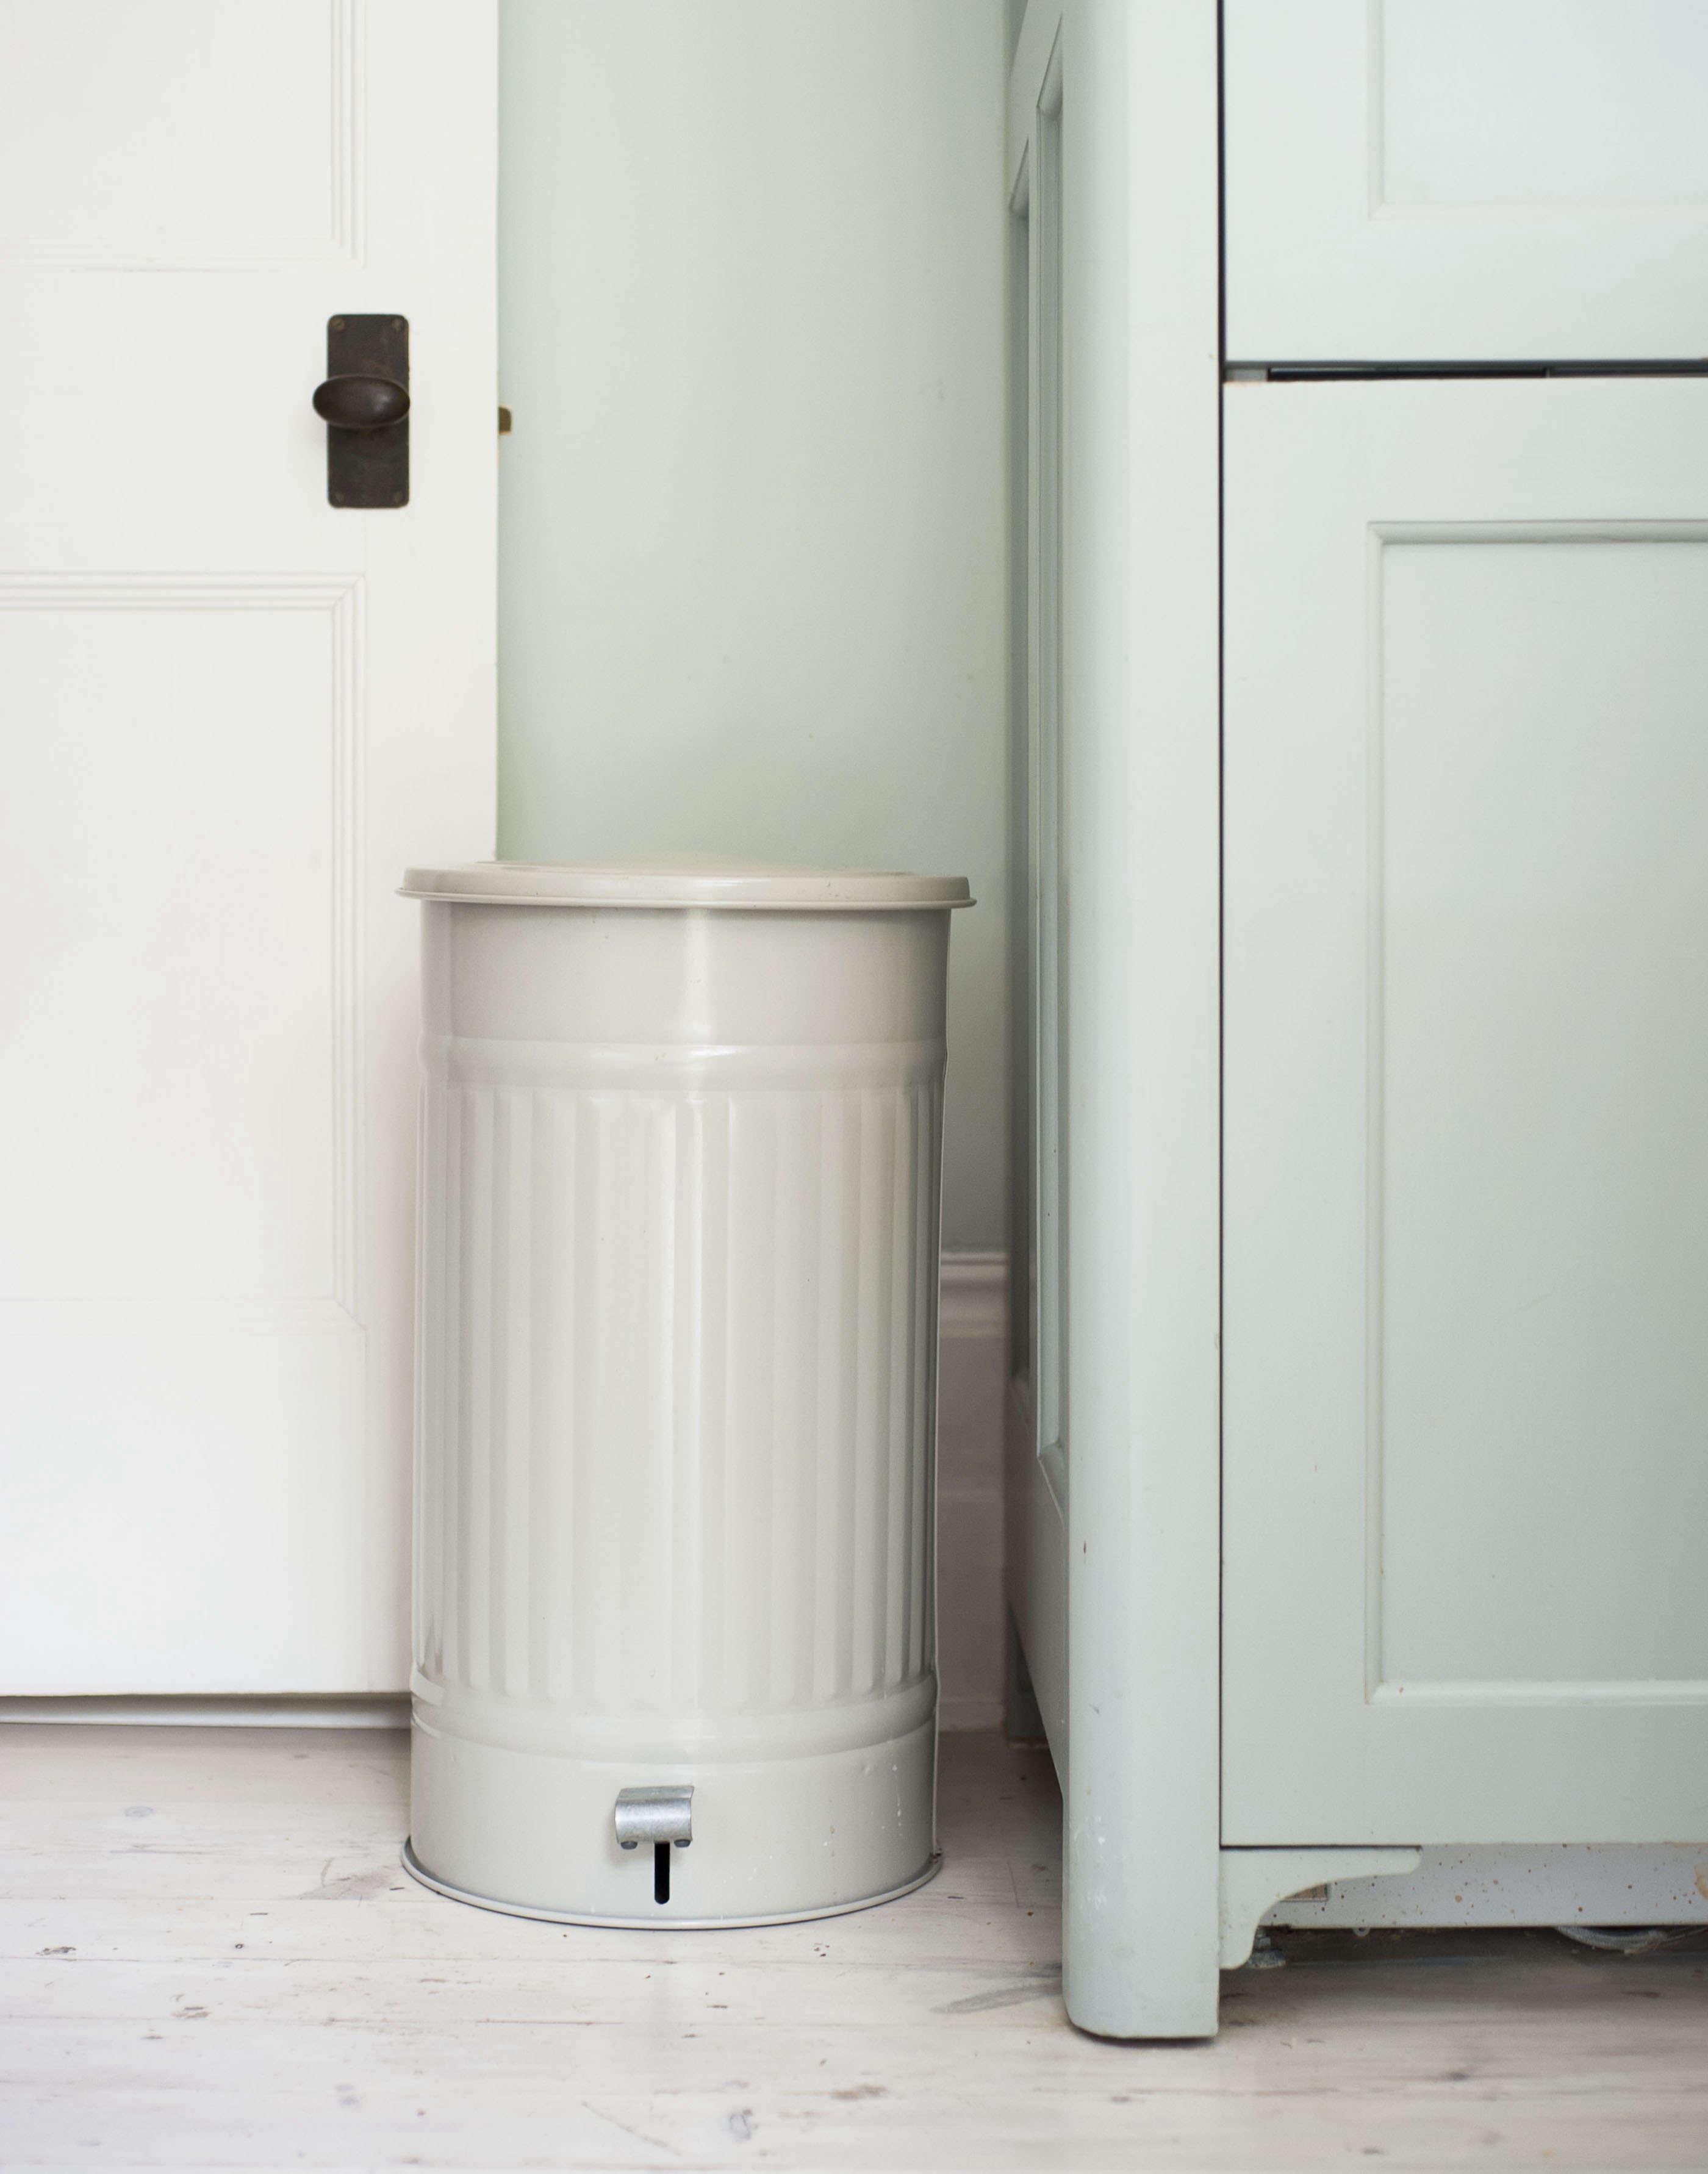 Gorgeous garbage: Enameled steel kitchen pedal bin trash can from Garden Trading in Michelle McKenna's London townhouse. Matthew Williams photo.